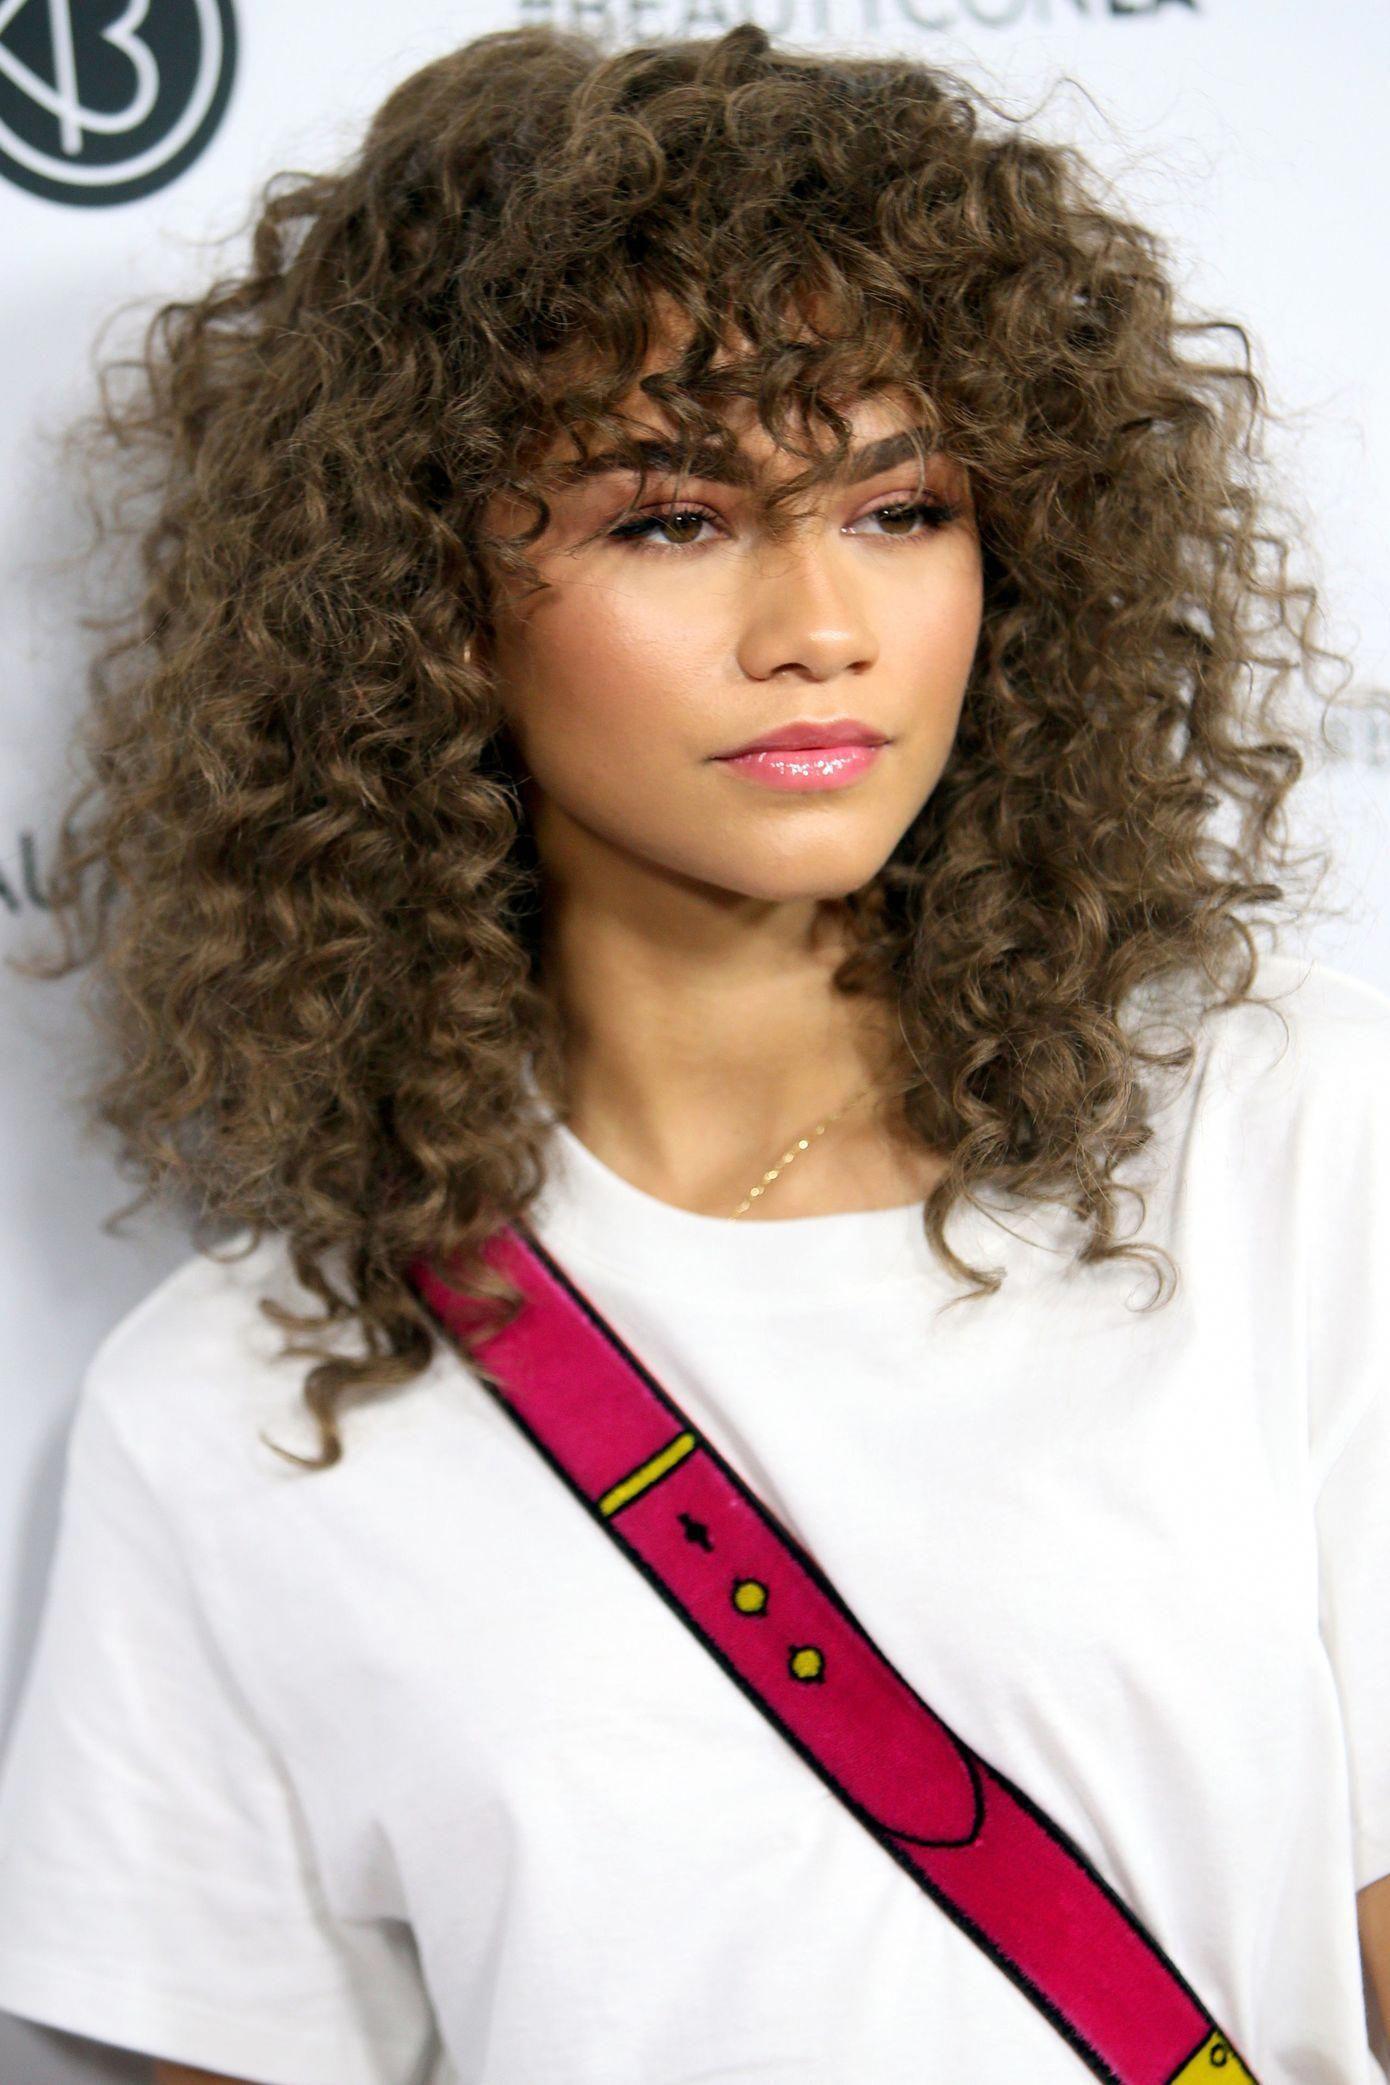 28 Easy Curly Hairstyles 2017 Cute Haircut Ideas For Curly Hair Curlyhairstylesnaturally In 2020 Curly Hair Styles Curly Hair Styles Naturally Curly Hair With Bangs